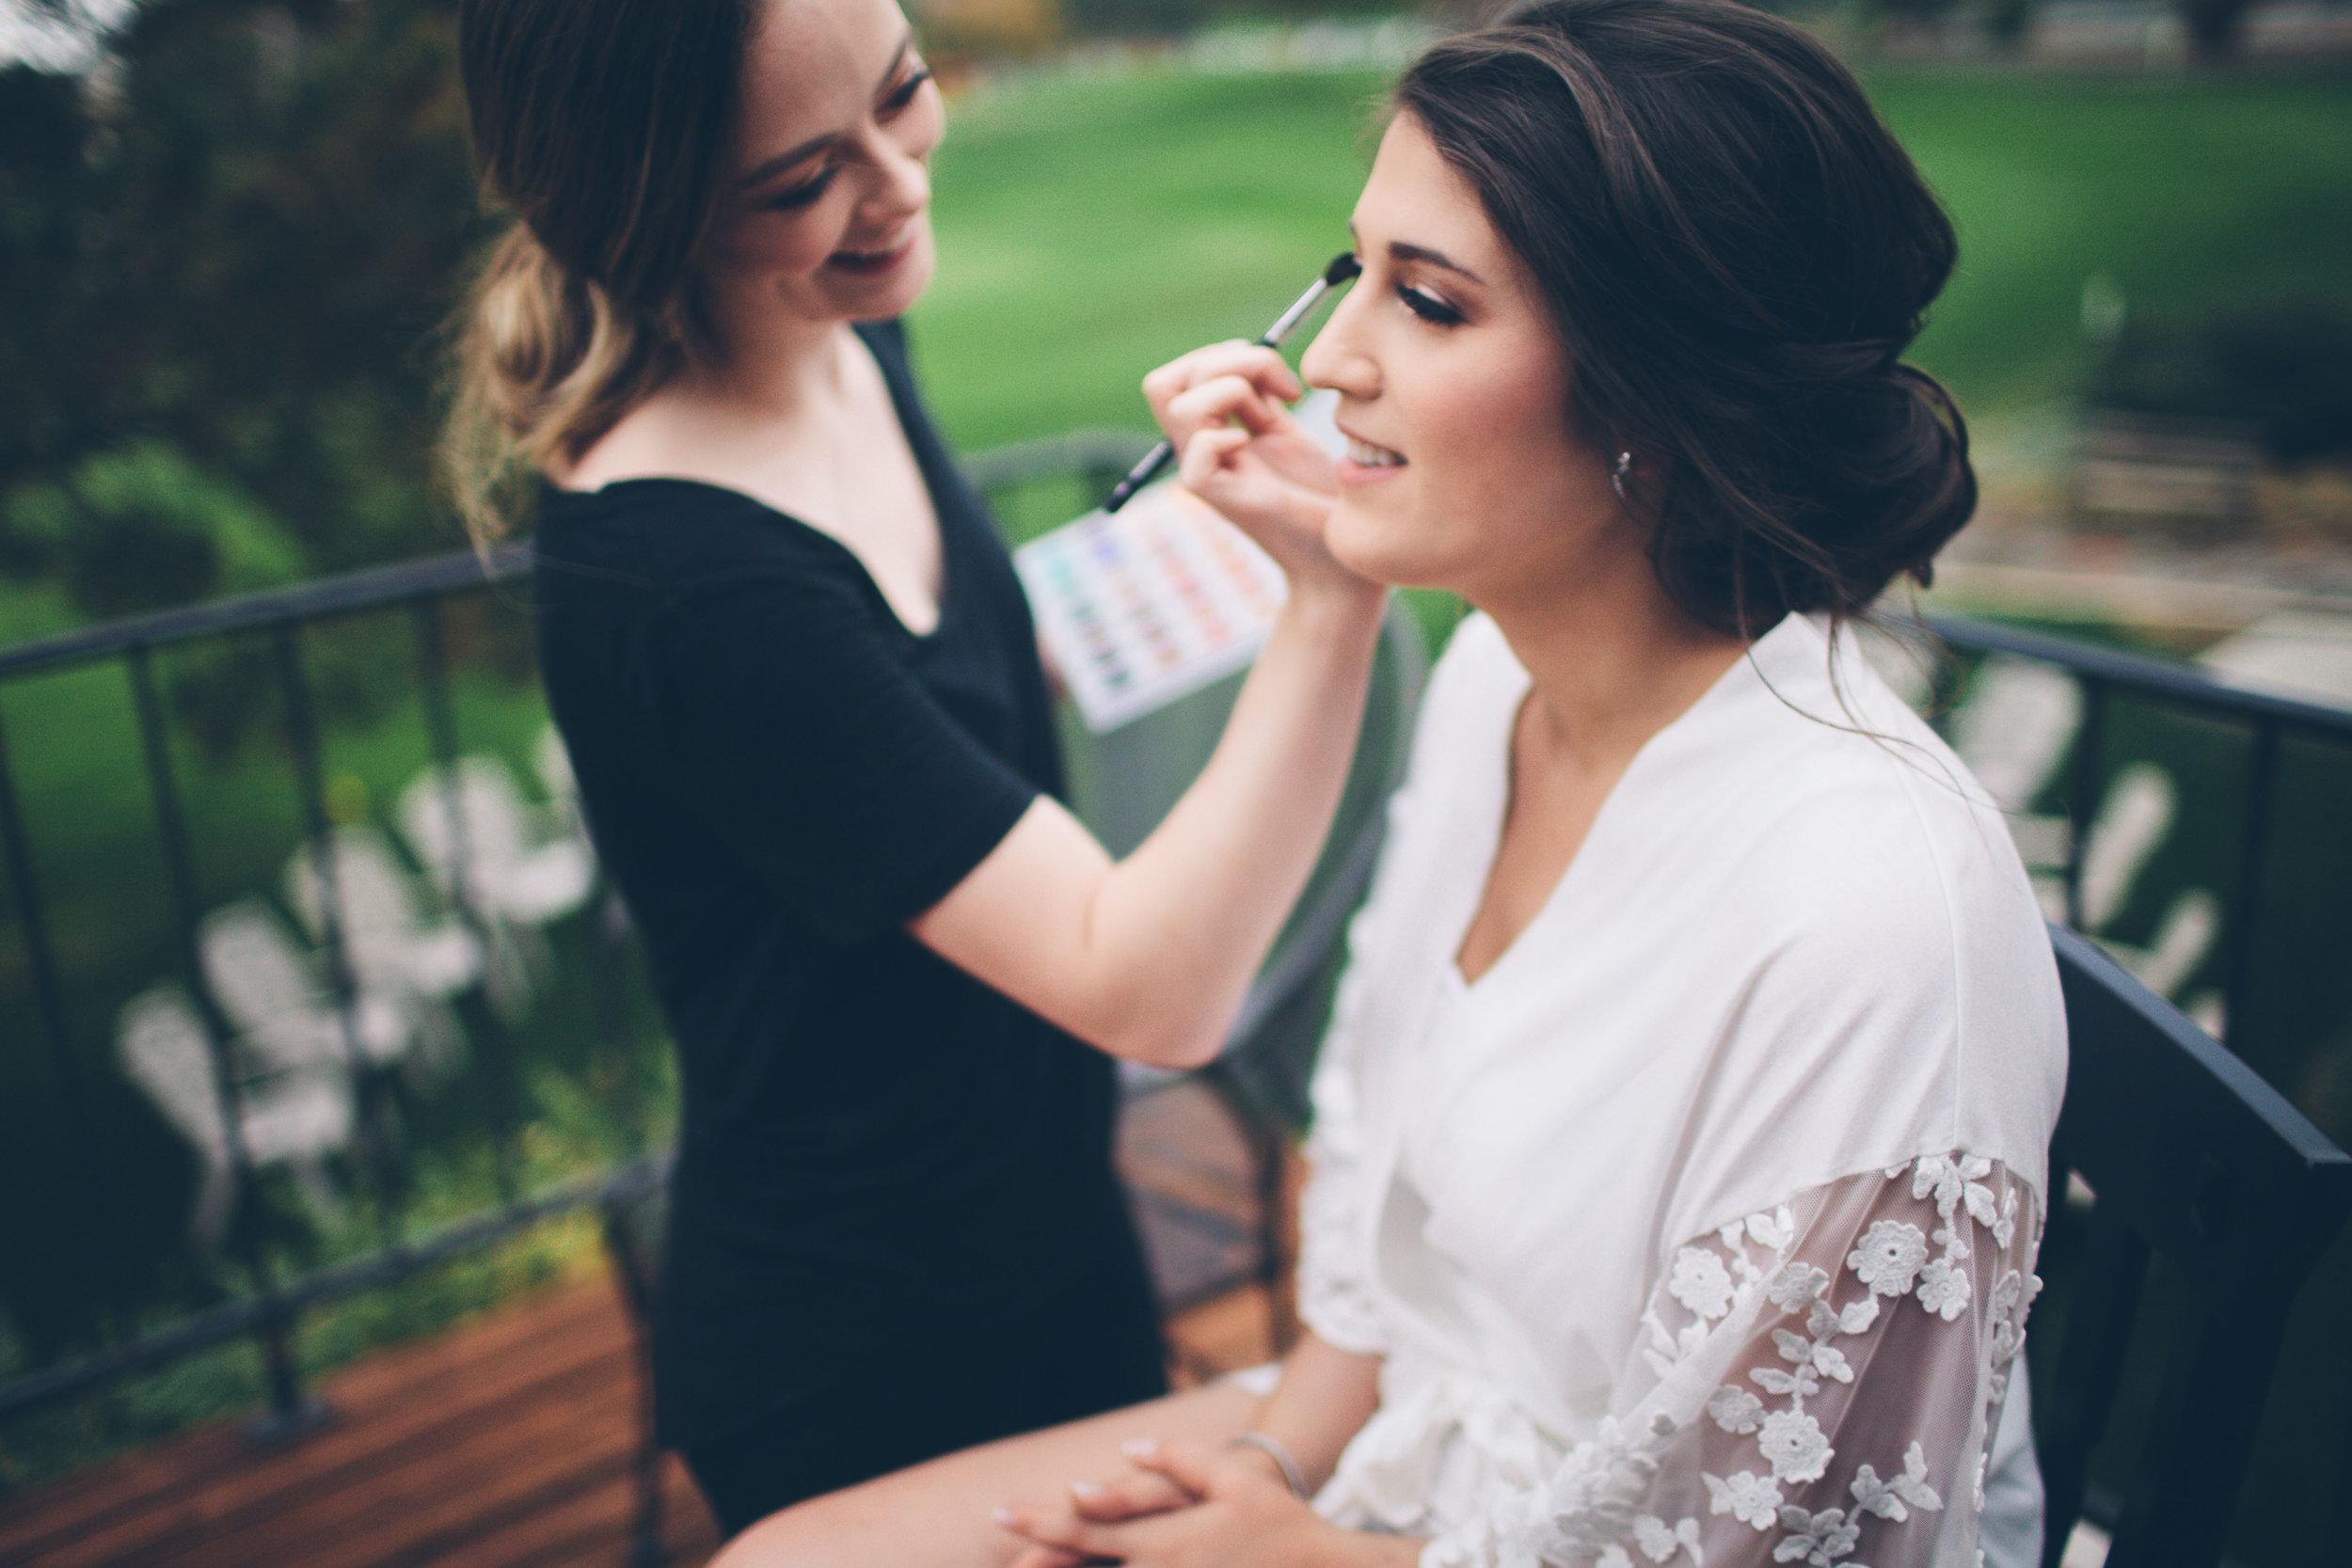 getting ready bride Spokane WA wedding